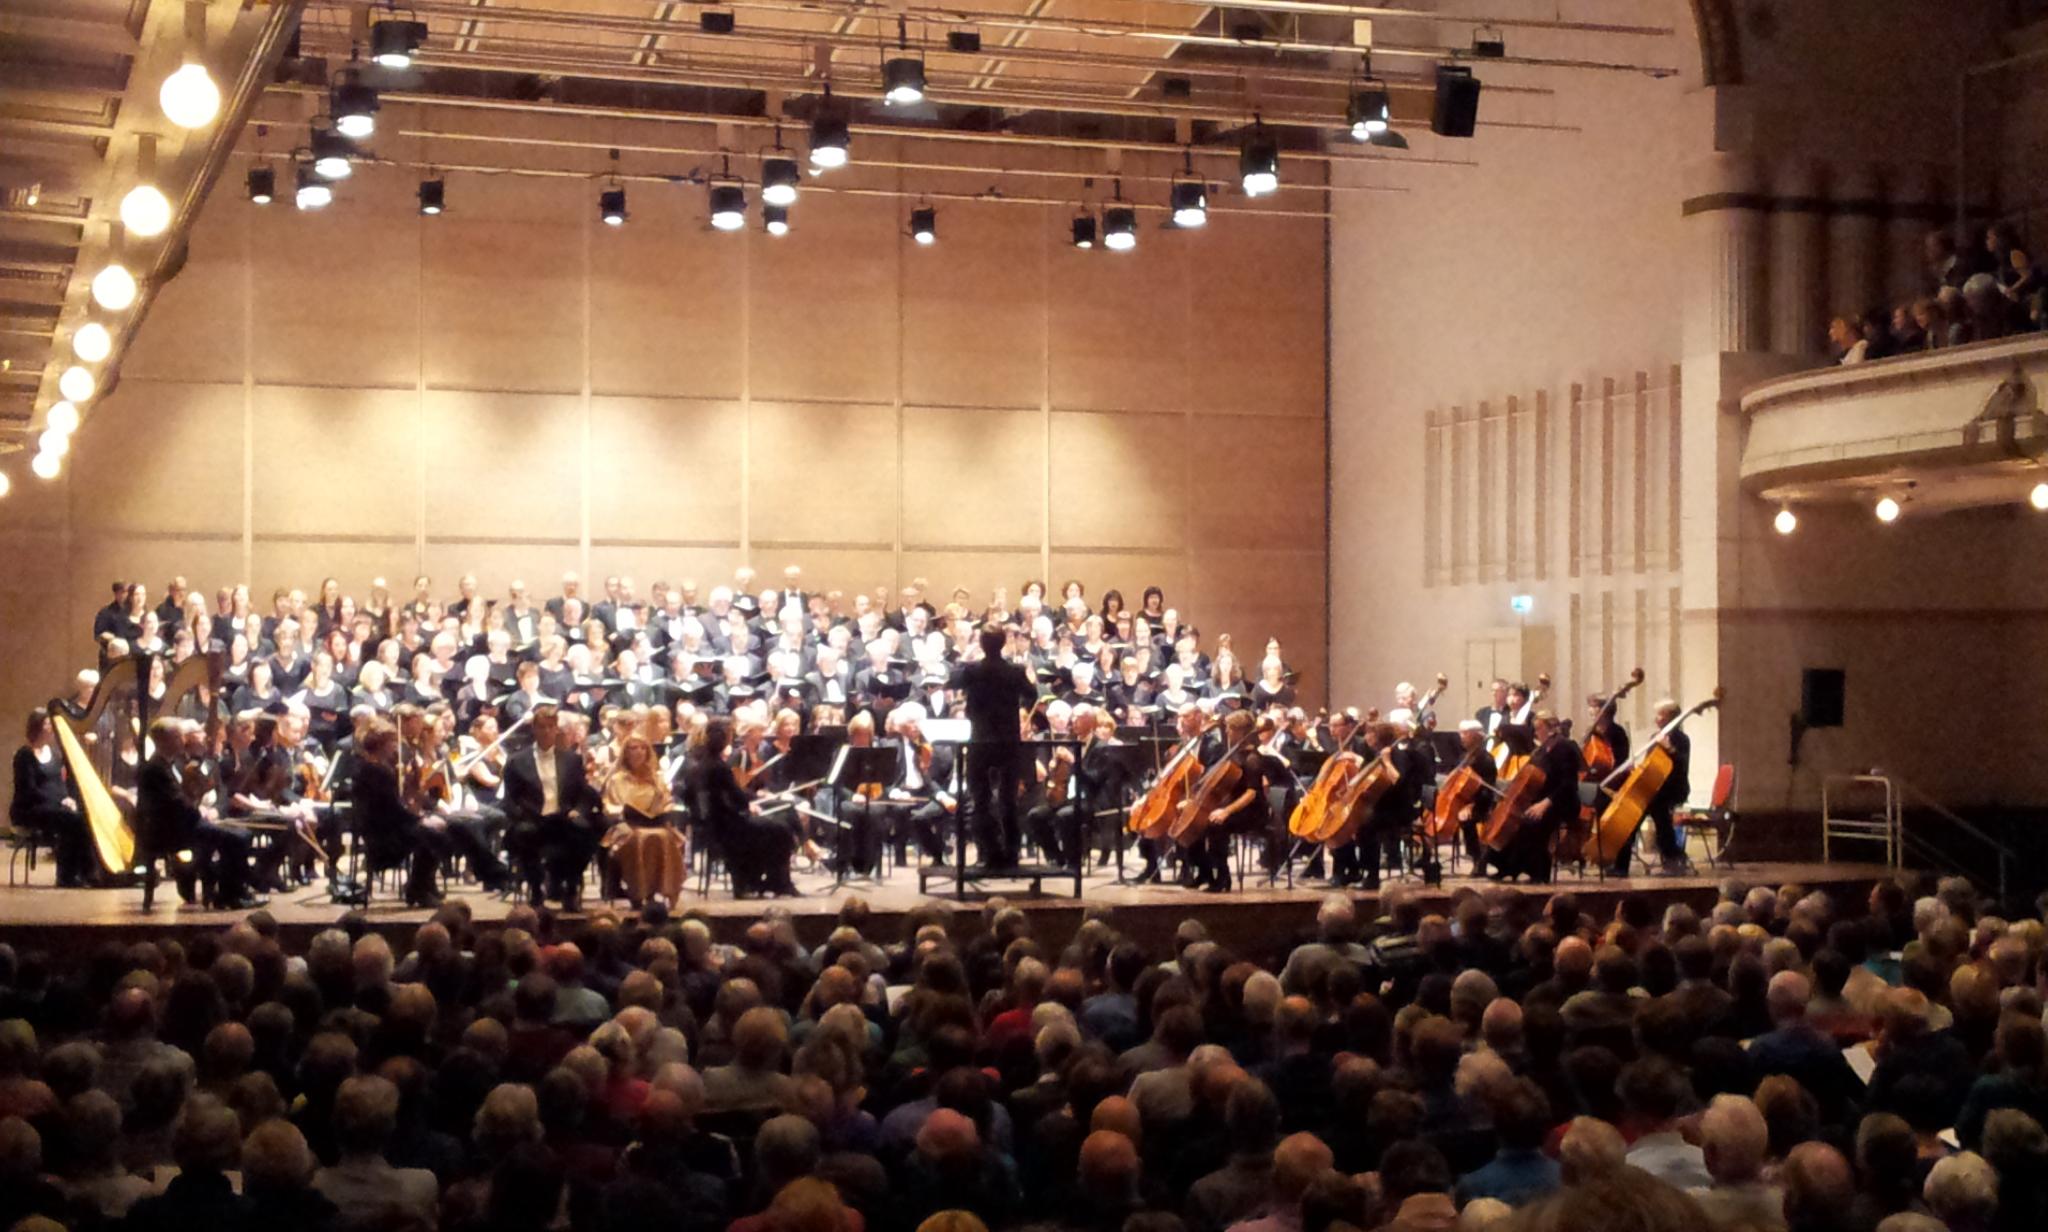 Vereeniging concert